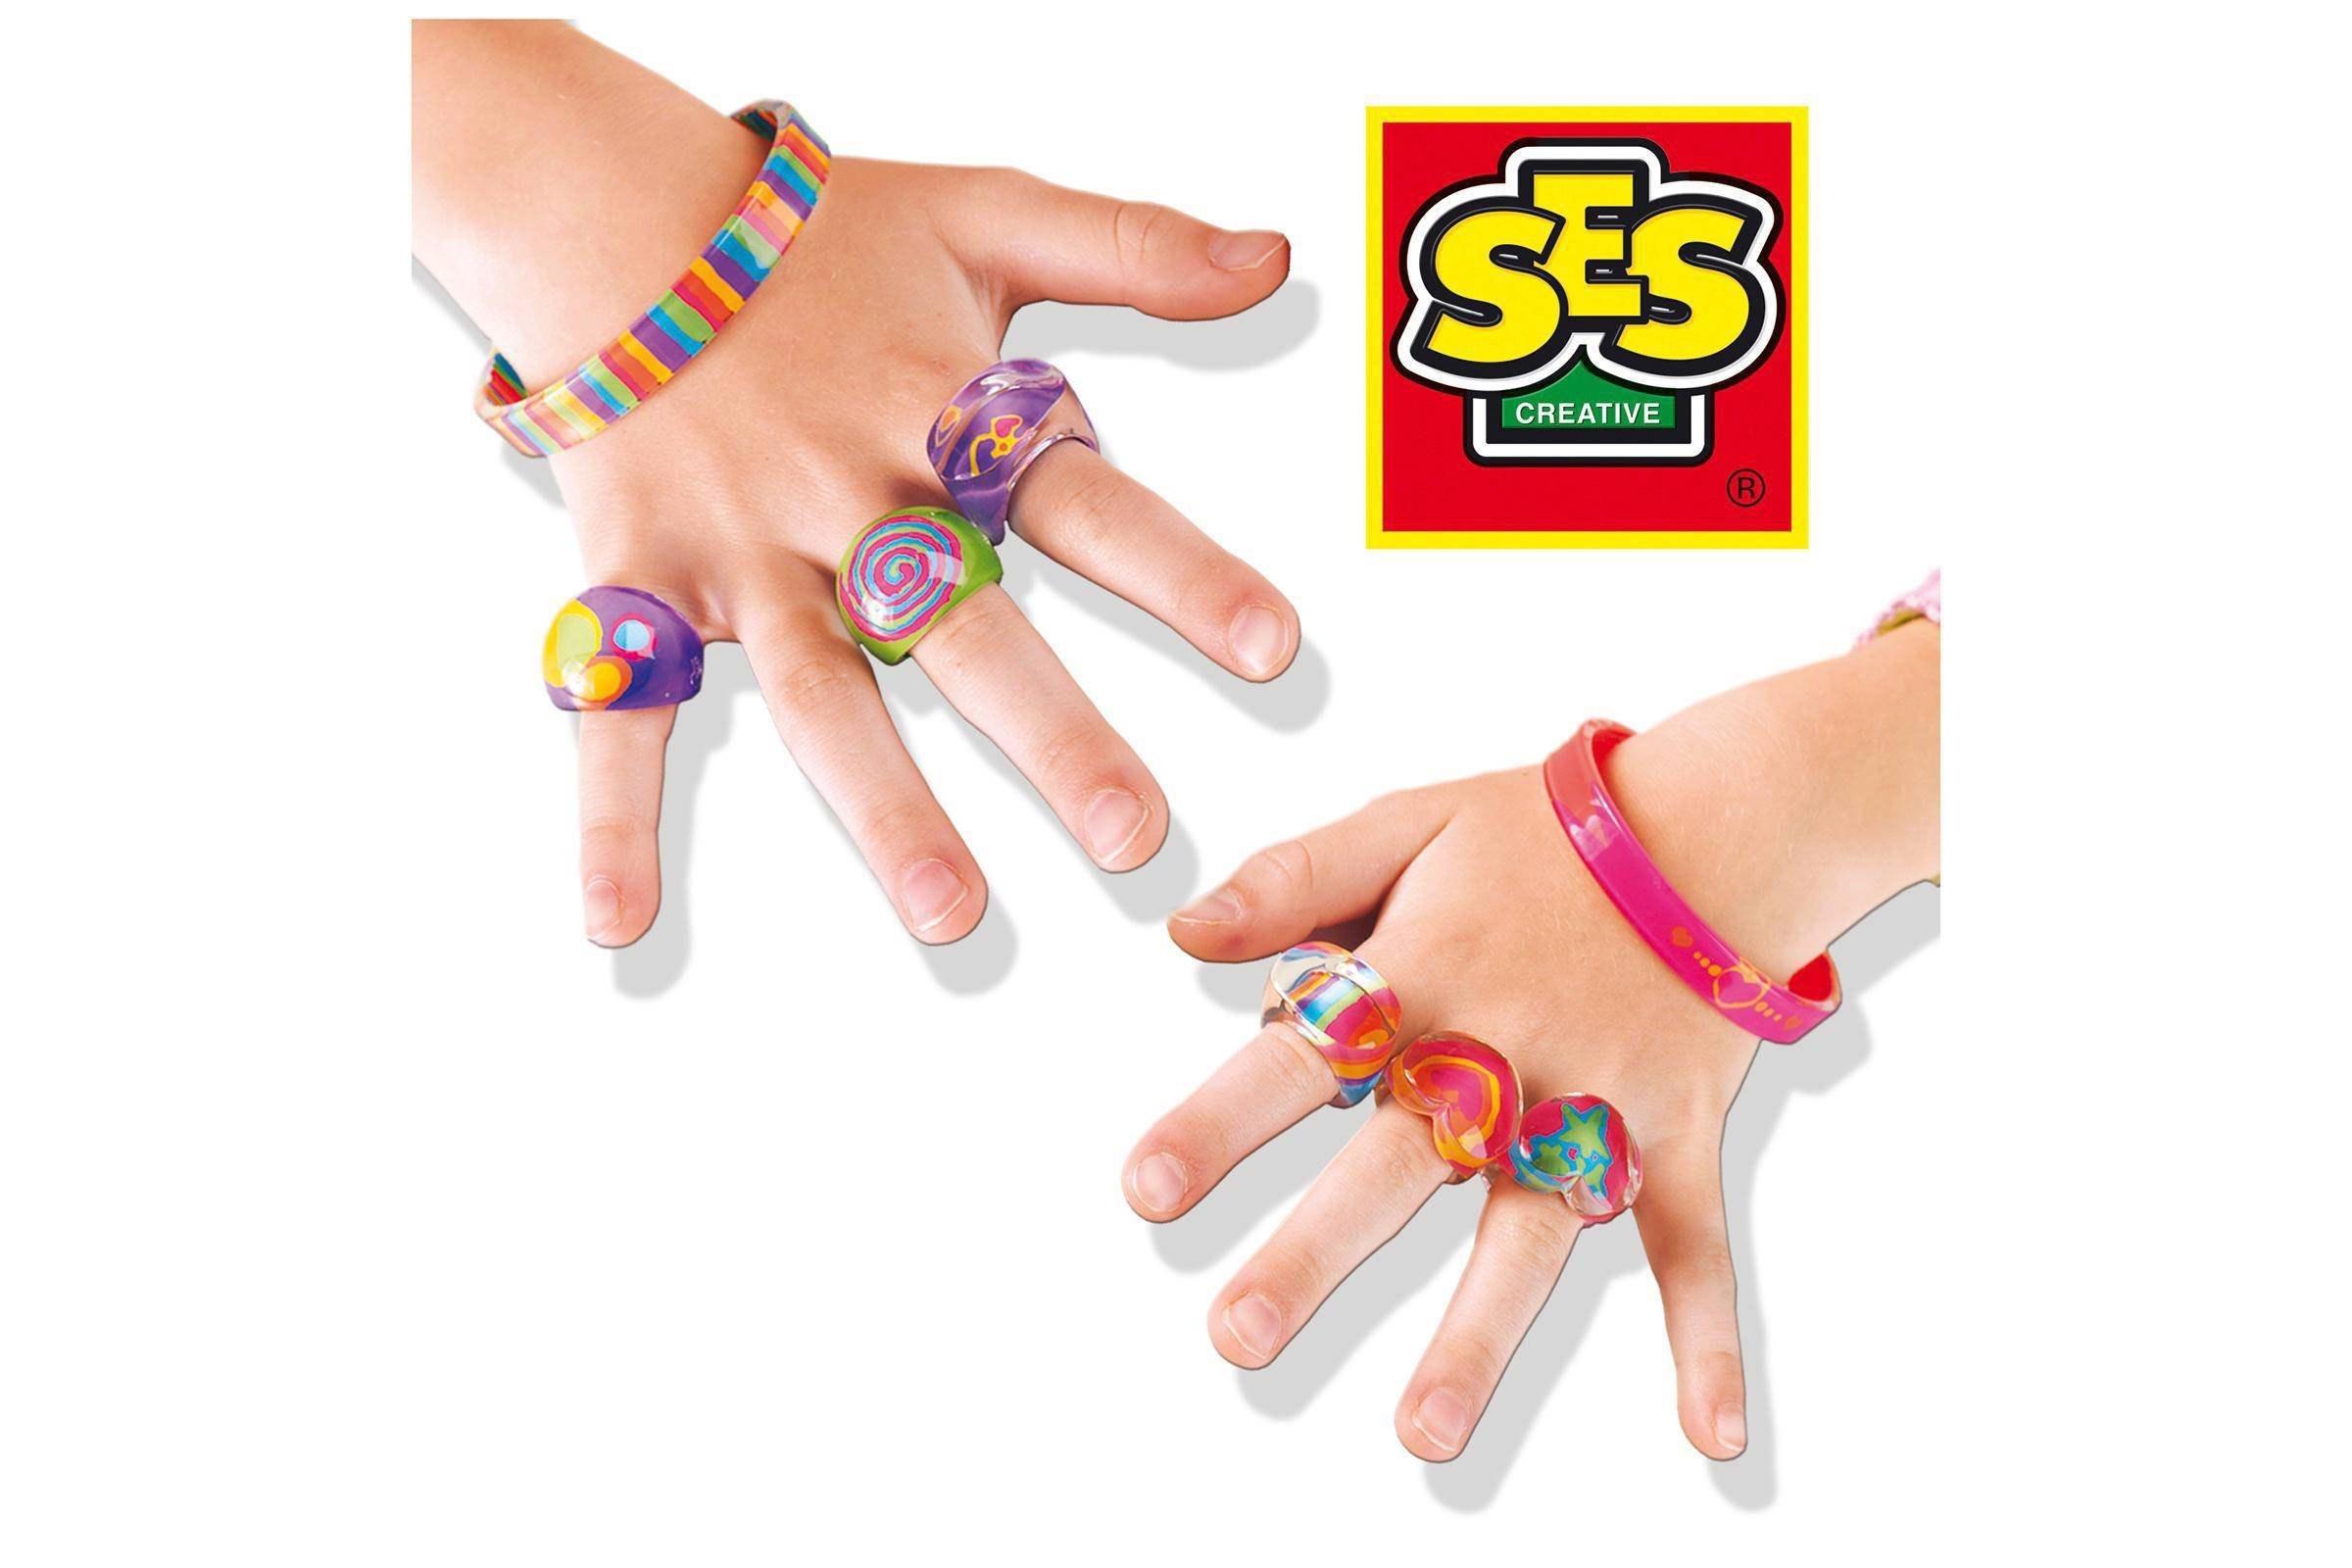 SES ringen & armbanden schilderen